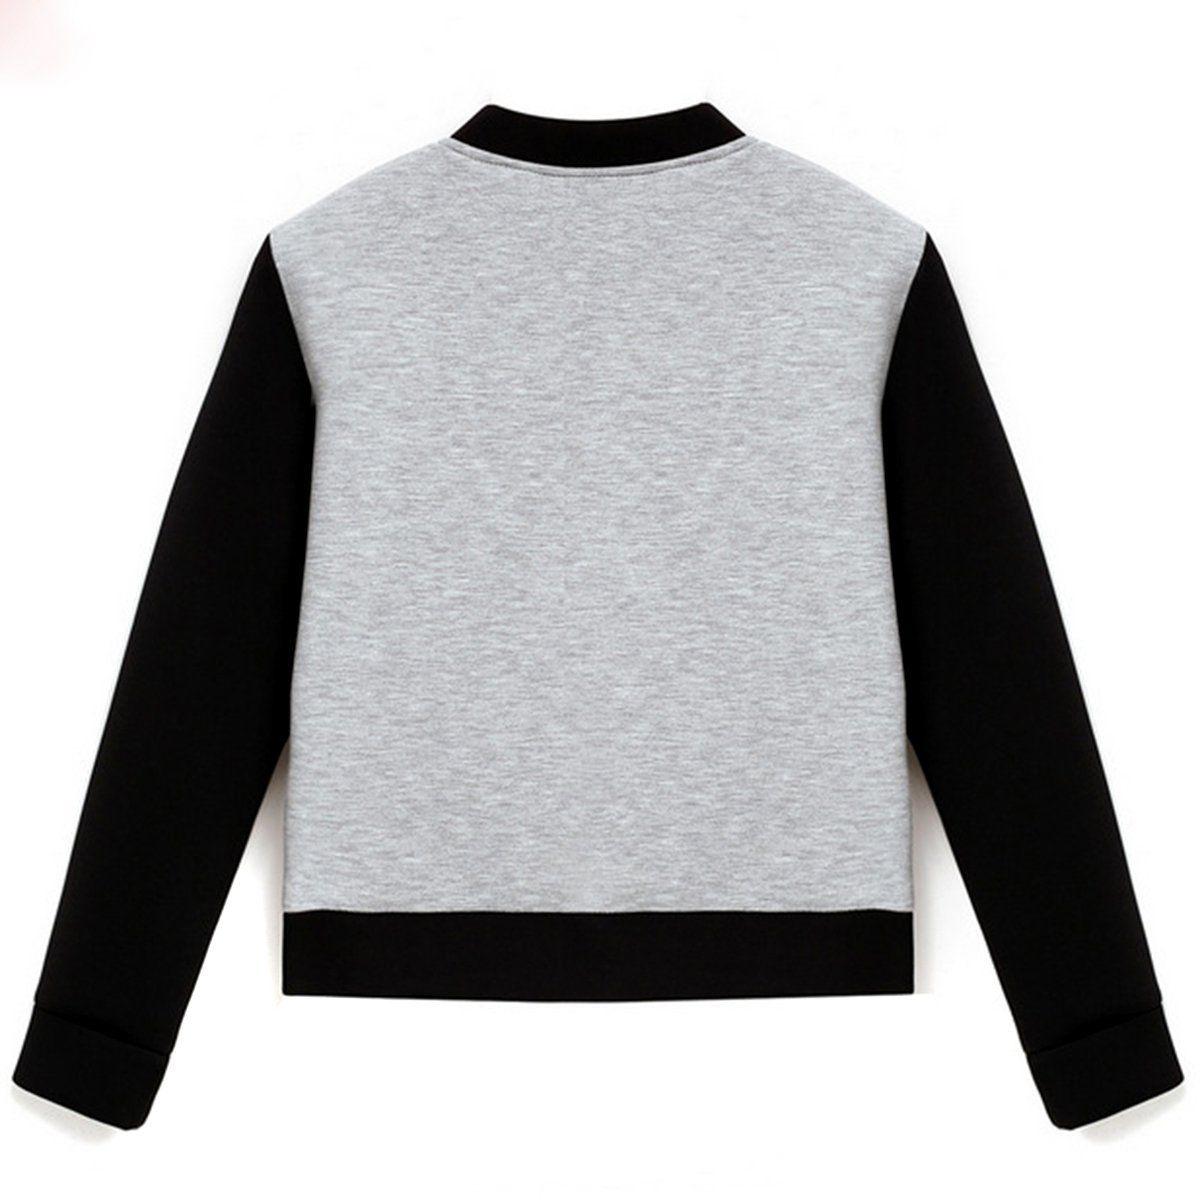 Atutmn winter Women basic coats bomber jacket Long Sleeve Stand Collar pullover Tops Jacket Short Coat Outwear chaquetas mujer